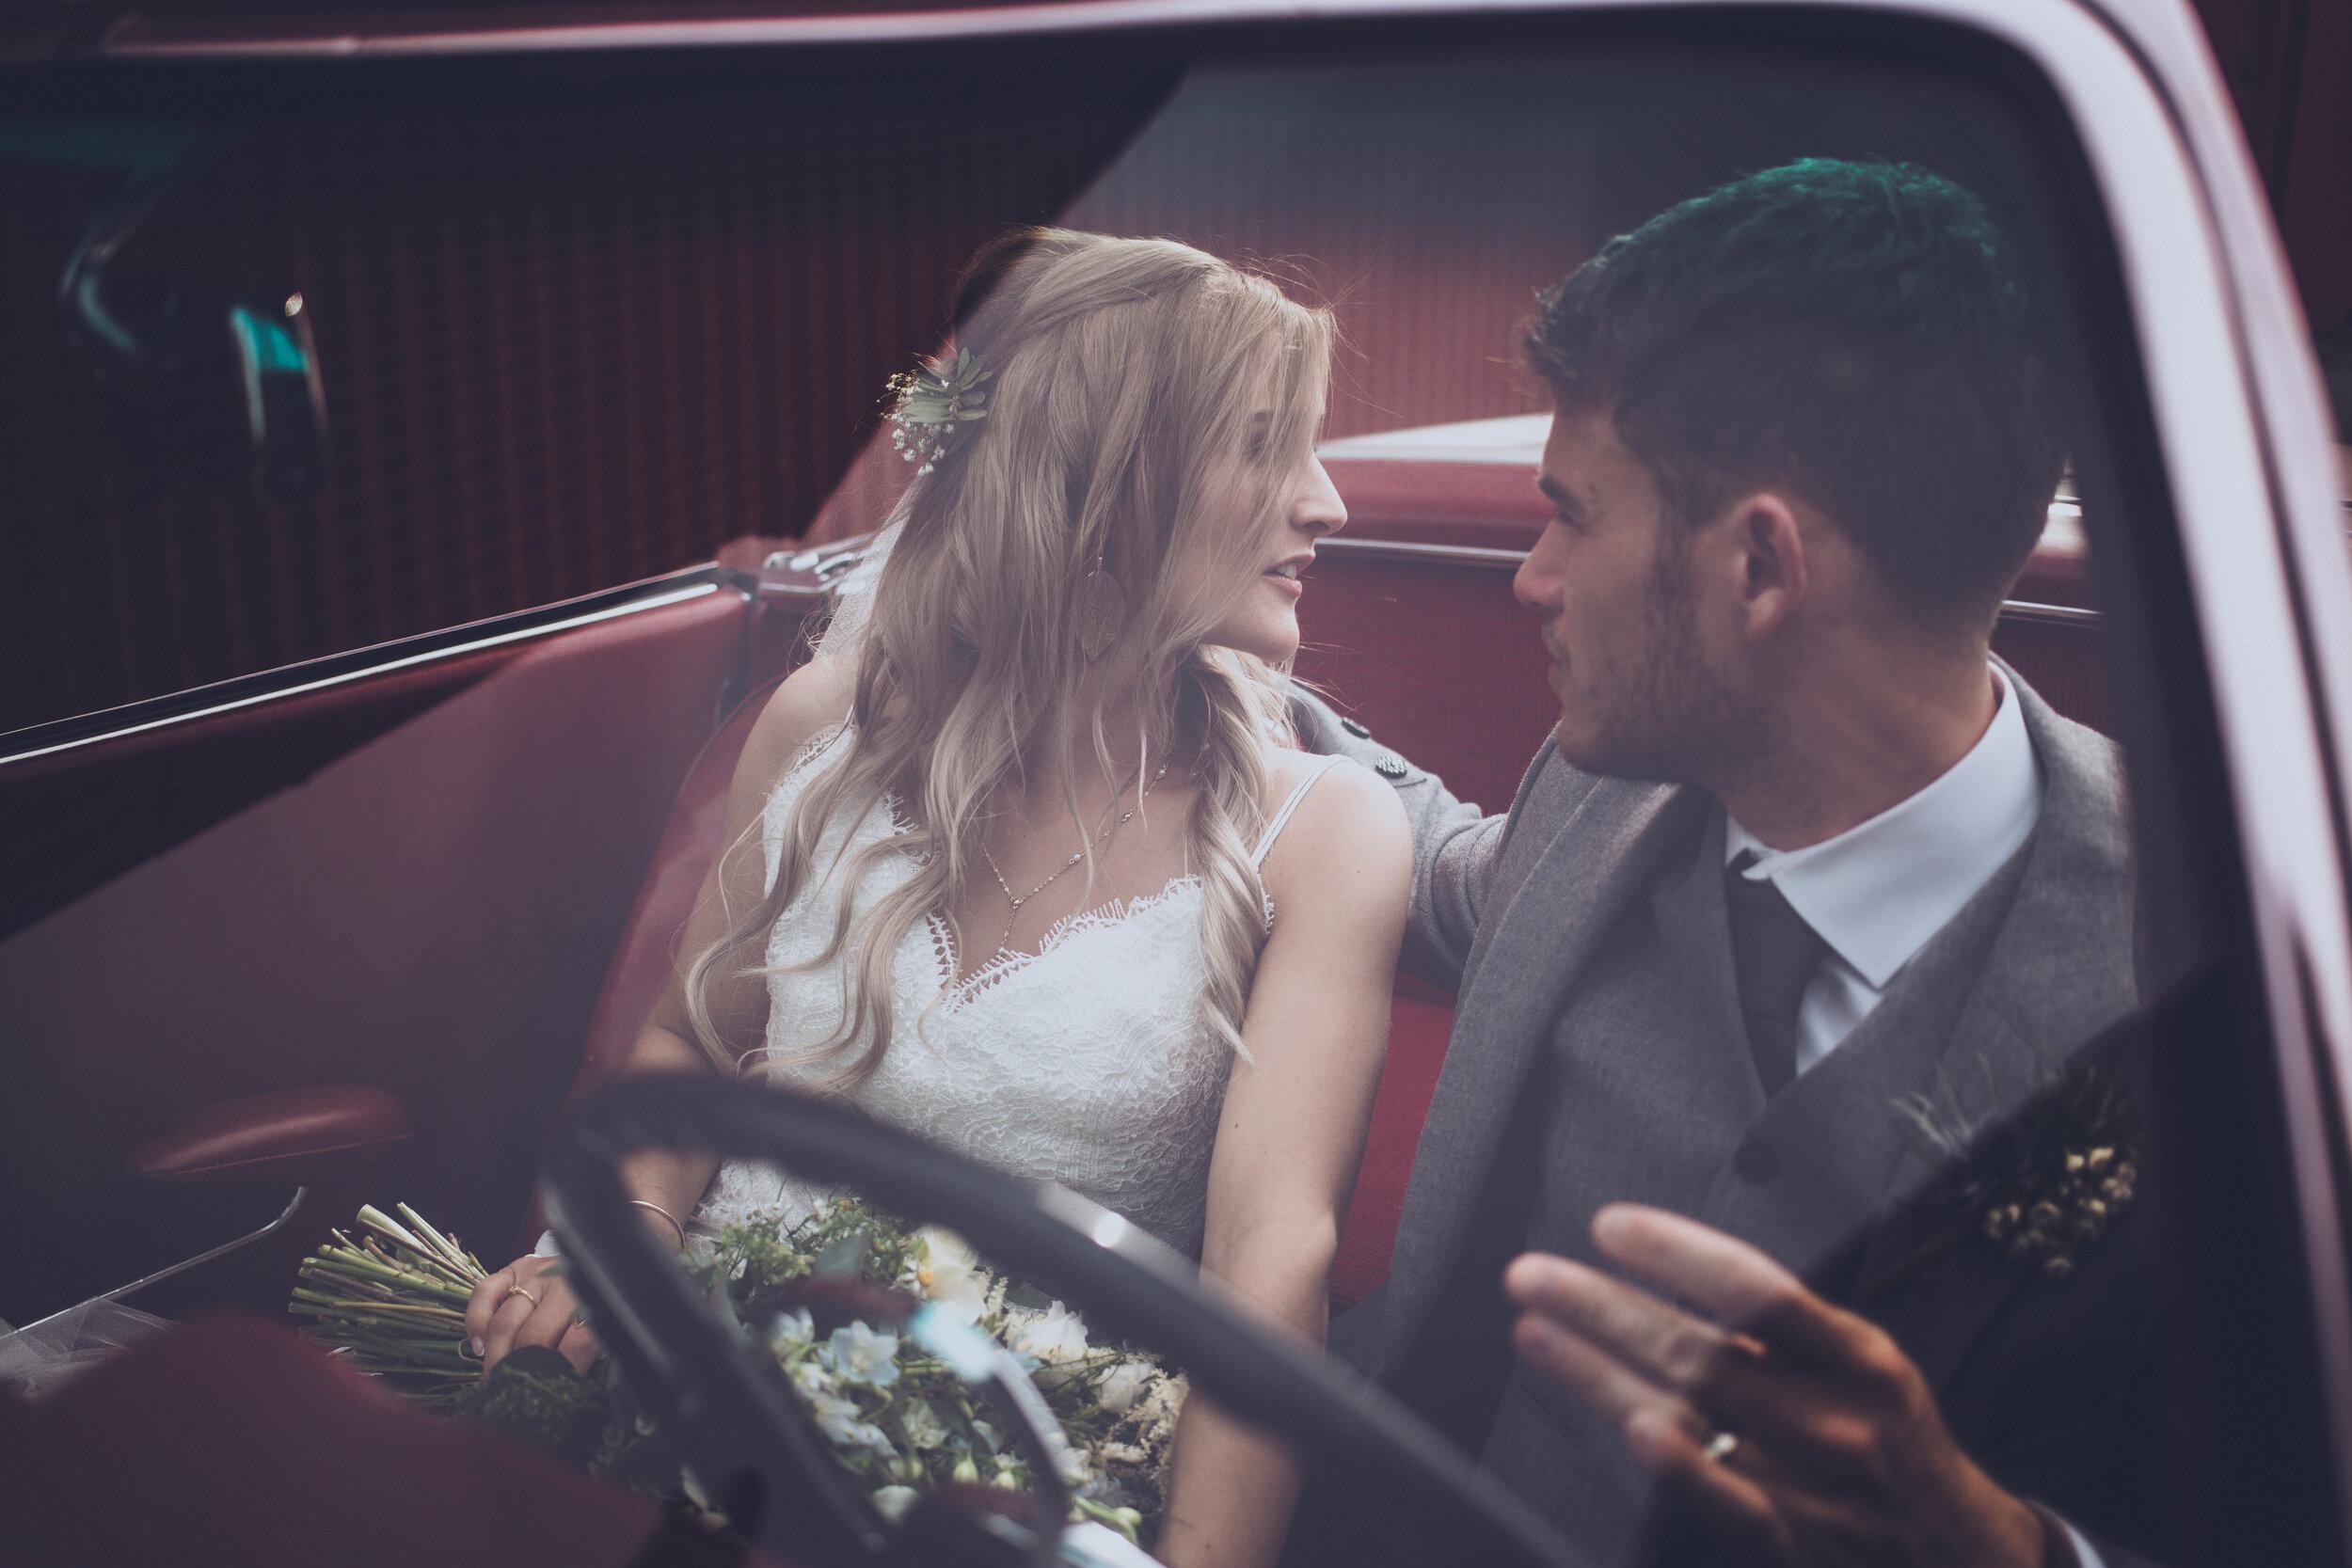 Dalduff Farm Ayrshire Wedding Photography - Claire Basiuk Photographer - 24.jpg